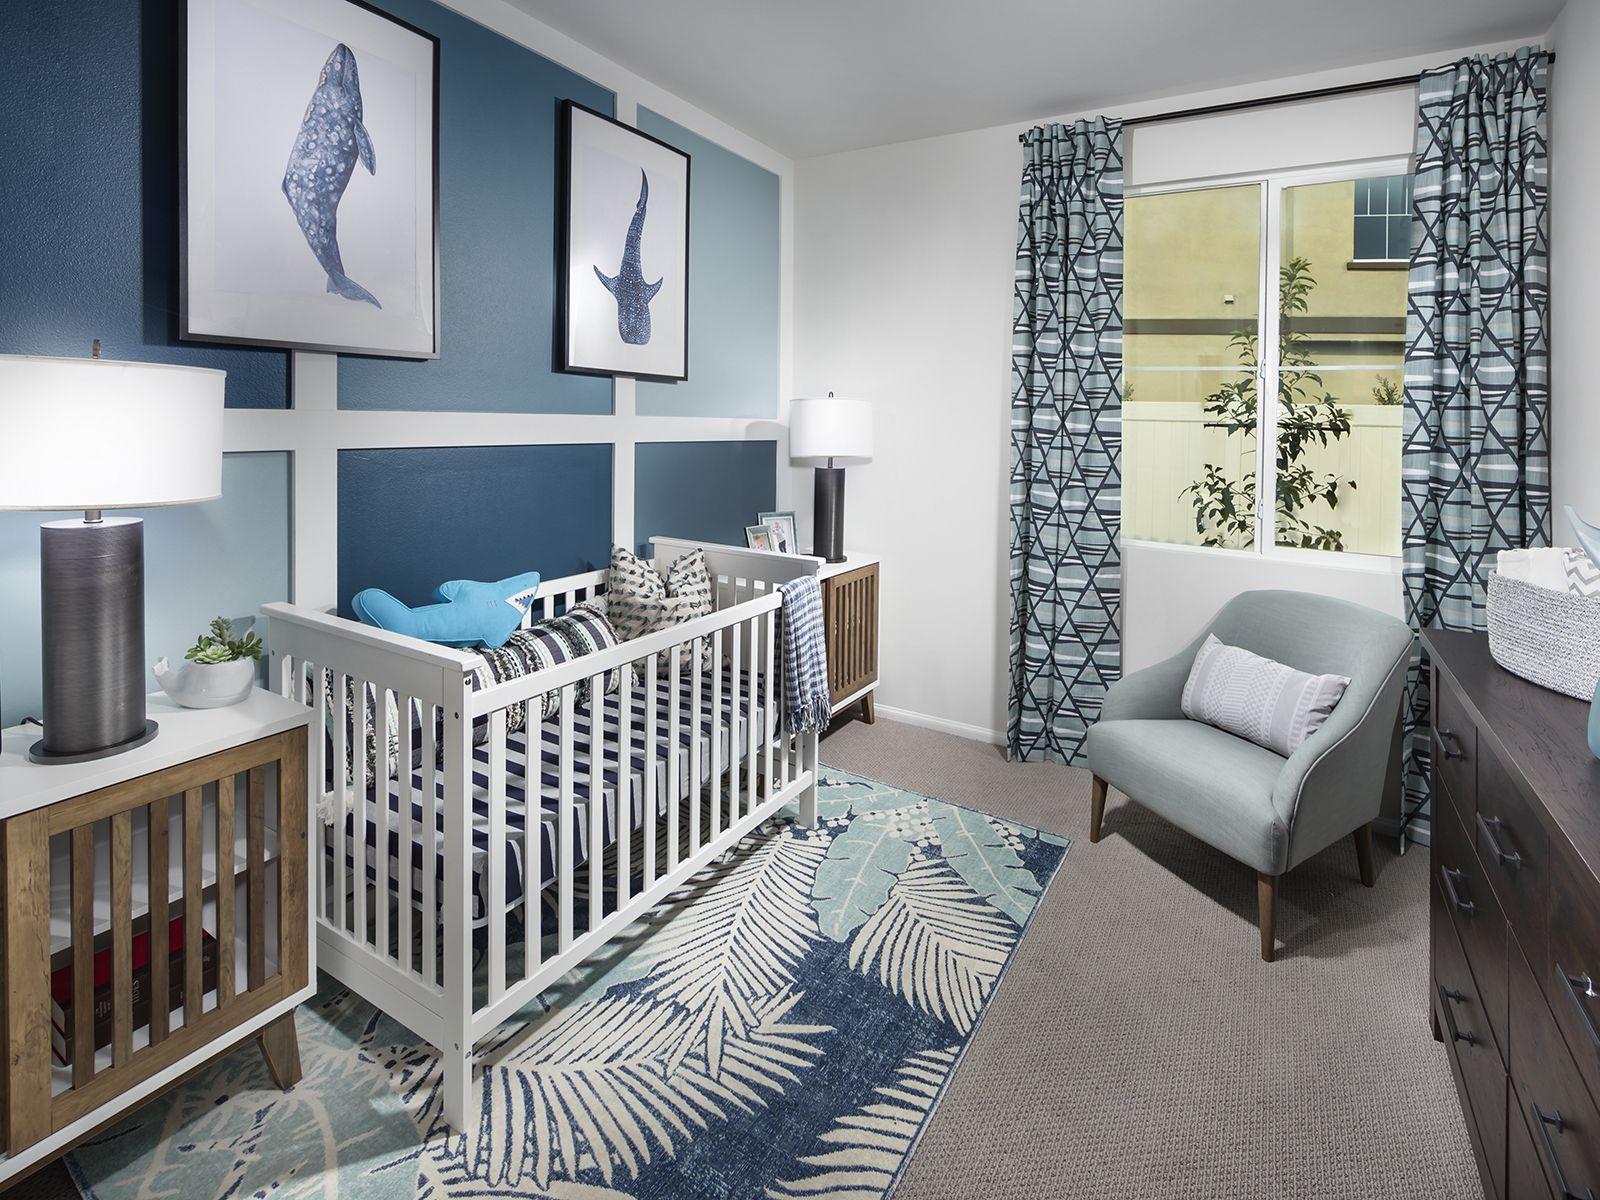 Bedroom featured in the Residence 1 By Meritage Homes in Riverside-San Bernardino, CA